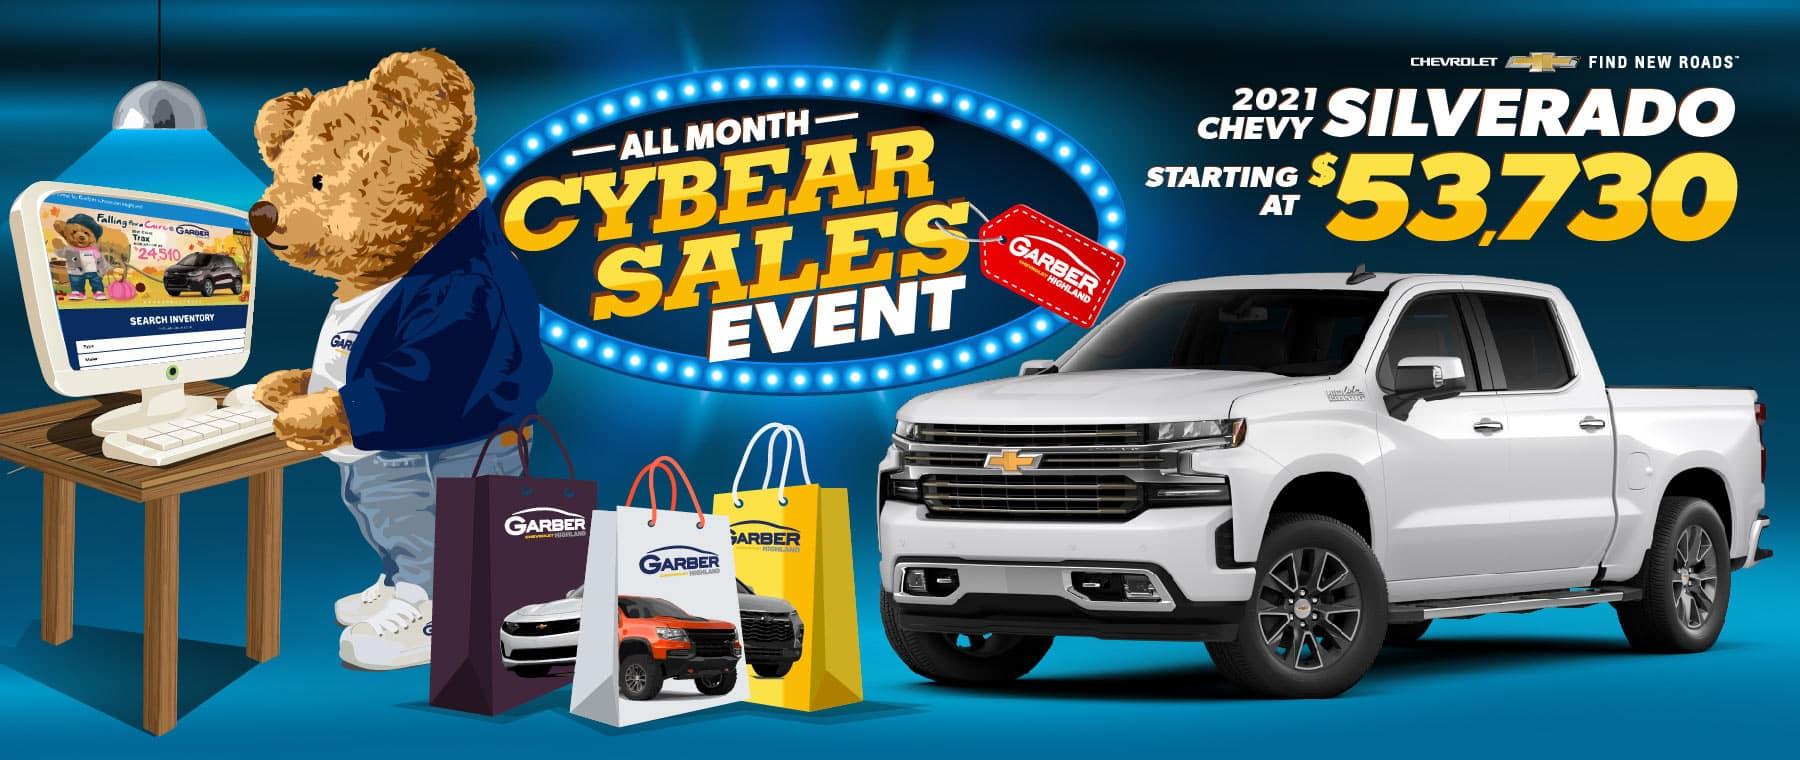 2021 Chevy Silverado 1500 - as low as $30,400